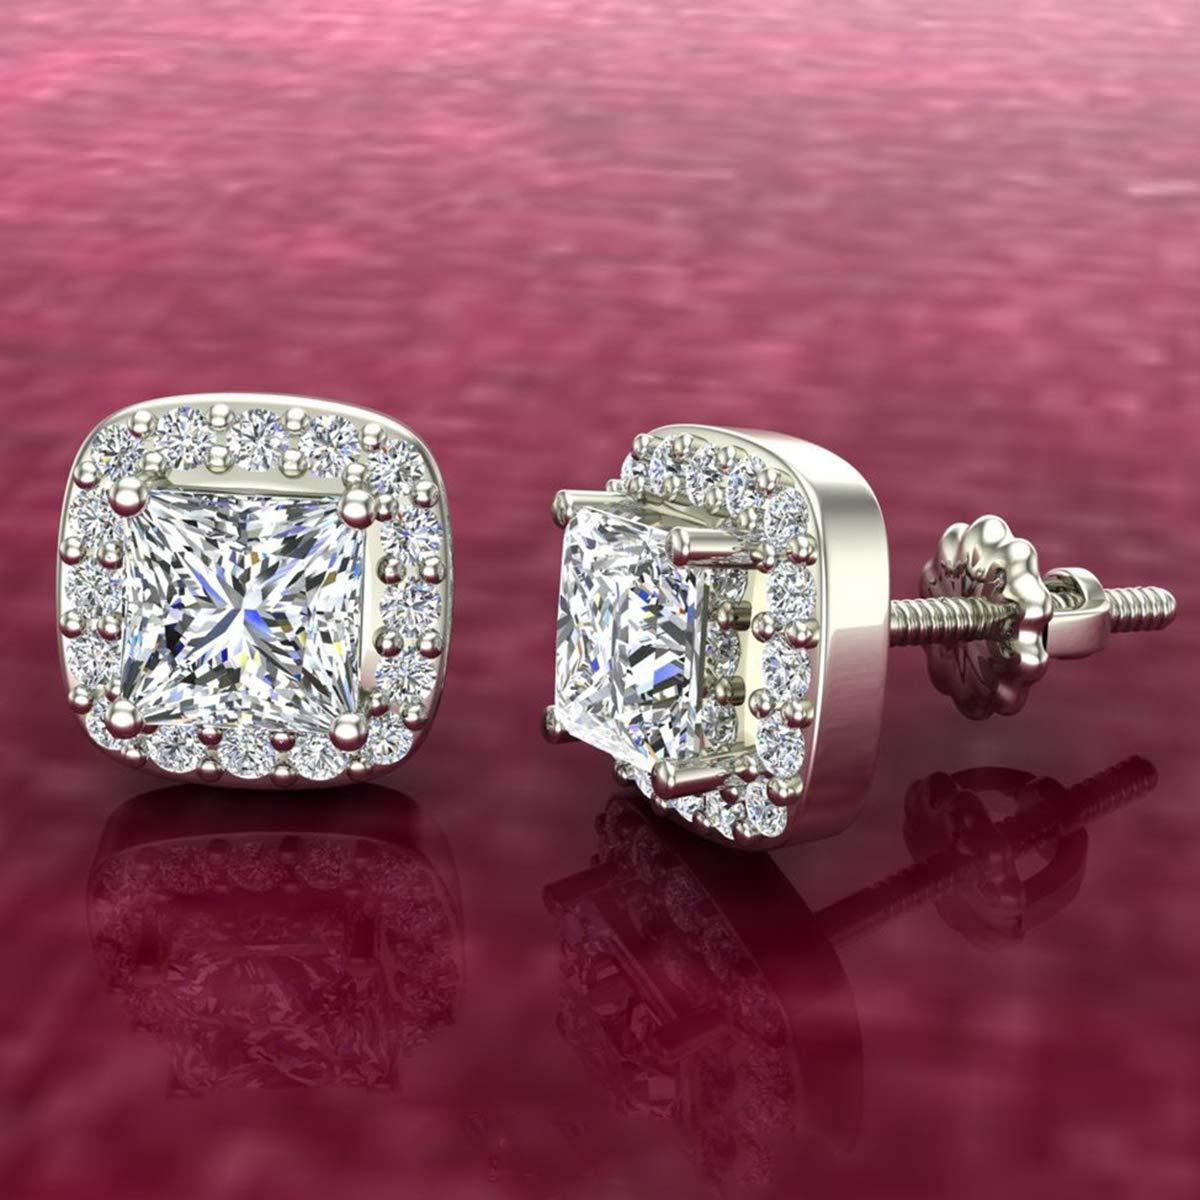 1.30 Ct Princess cut Cushion Style Halo Simulated Diamond Stud Earrings 14K White Gold Over